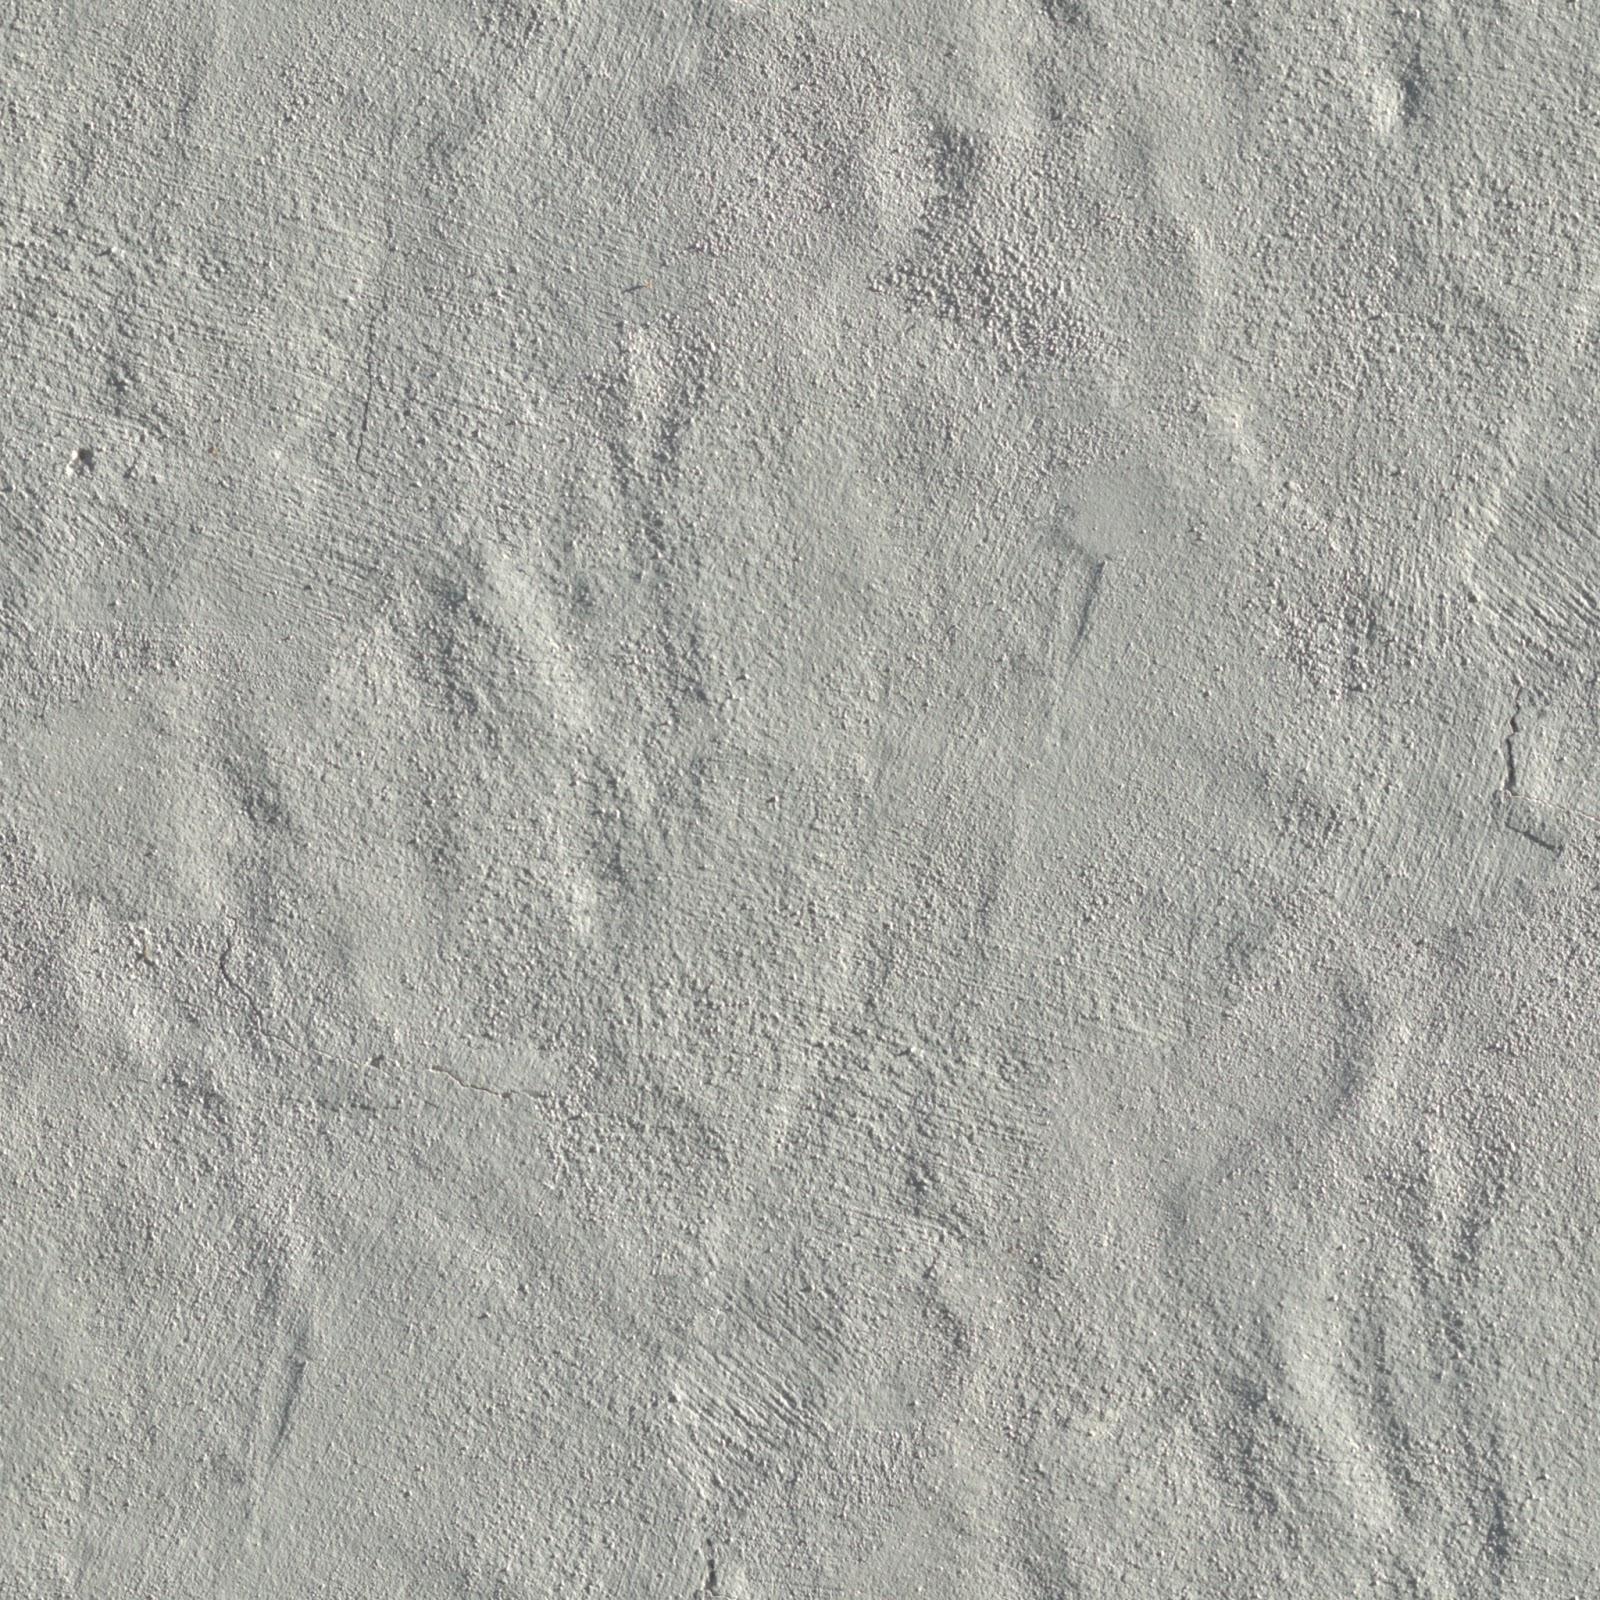 High Resolution Seamless Textures Stucco rough wallpaper seamless